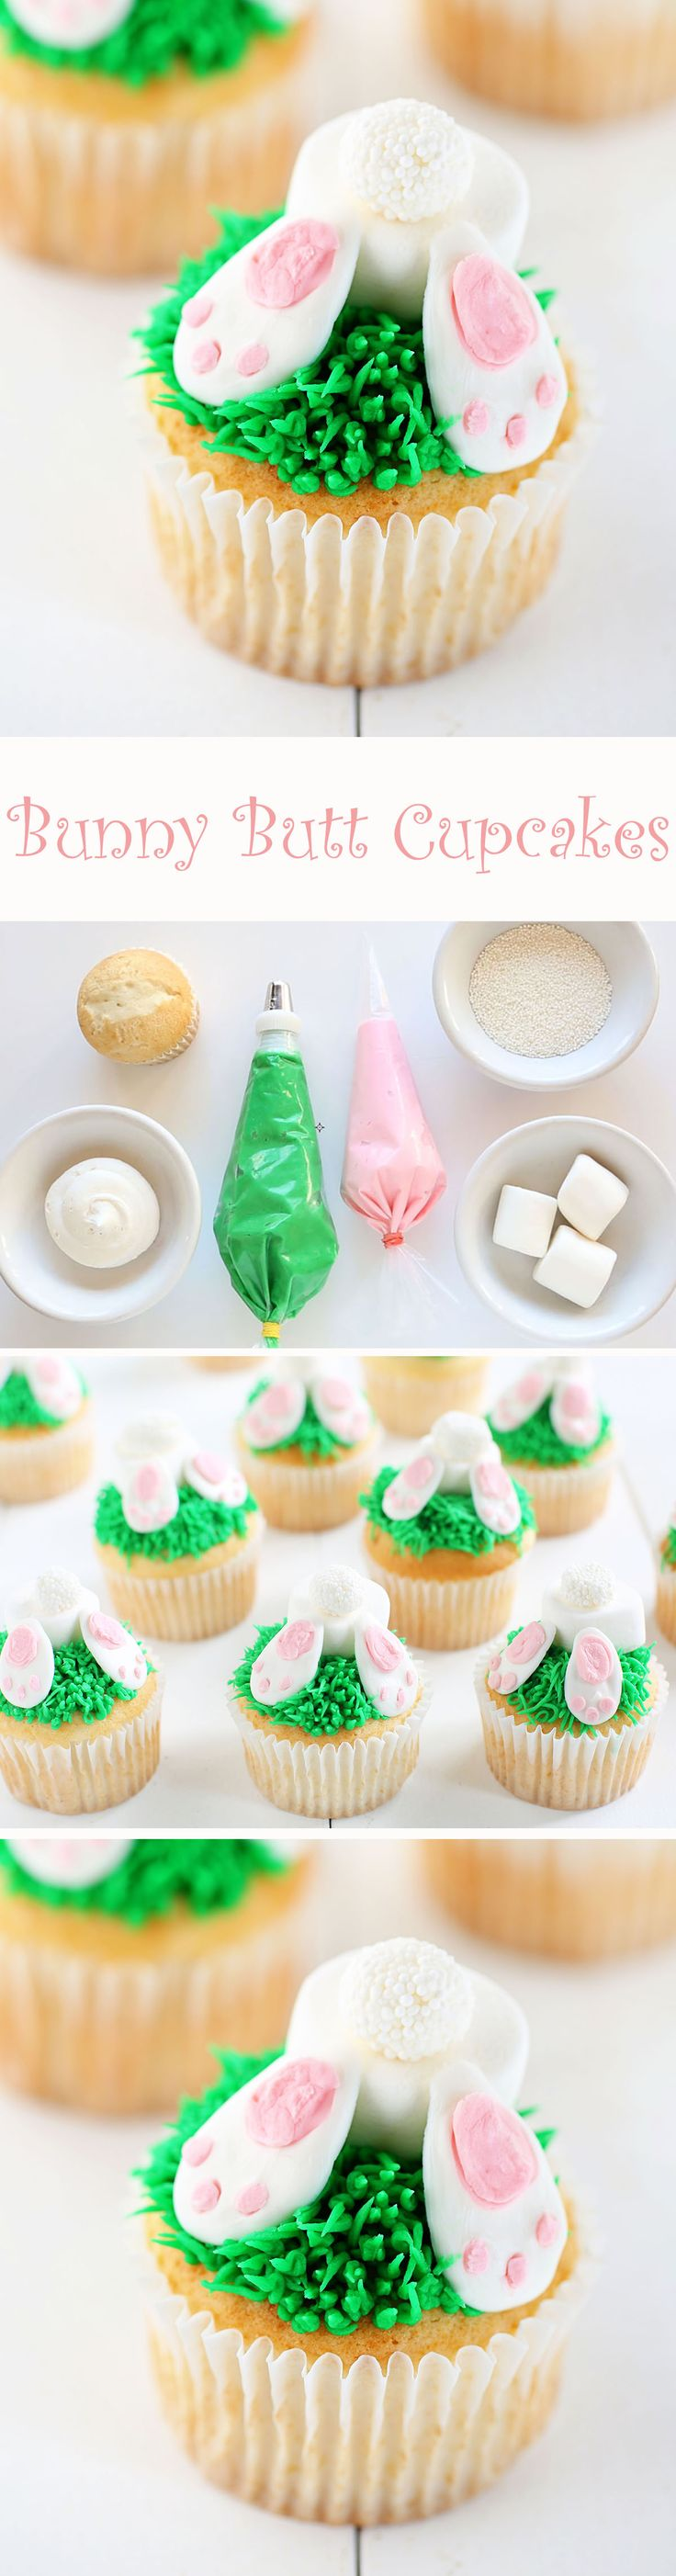 Bunny Butt Cupcakes! An adorable and delicious Easter dessert recipe.